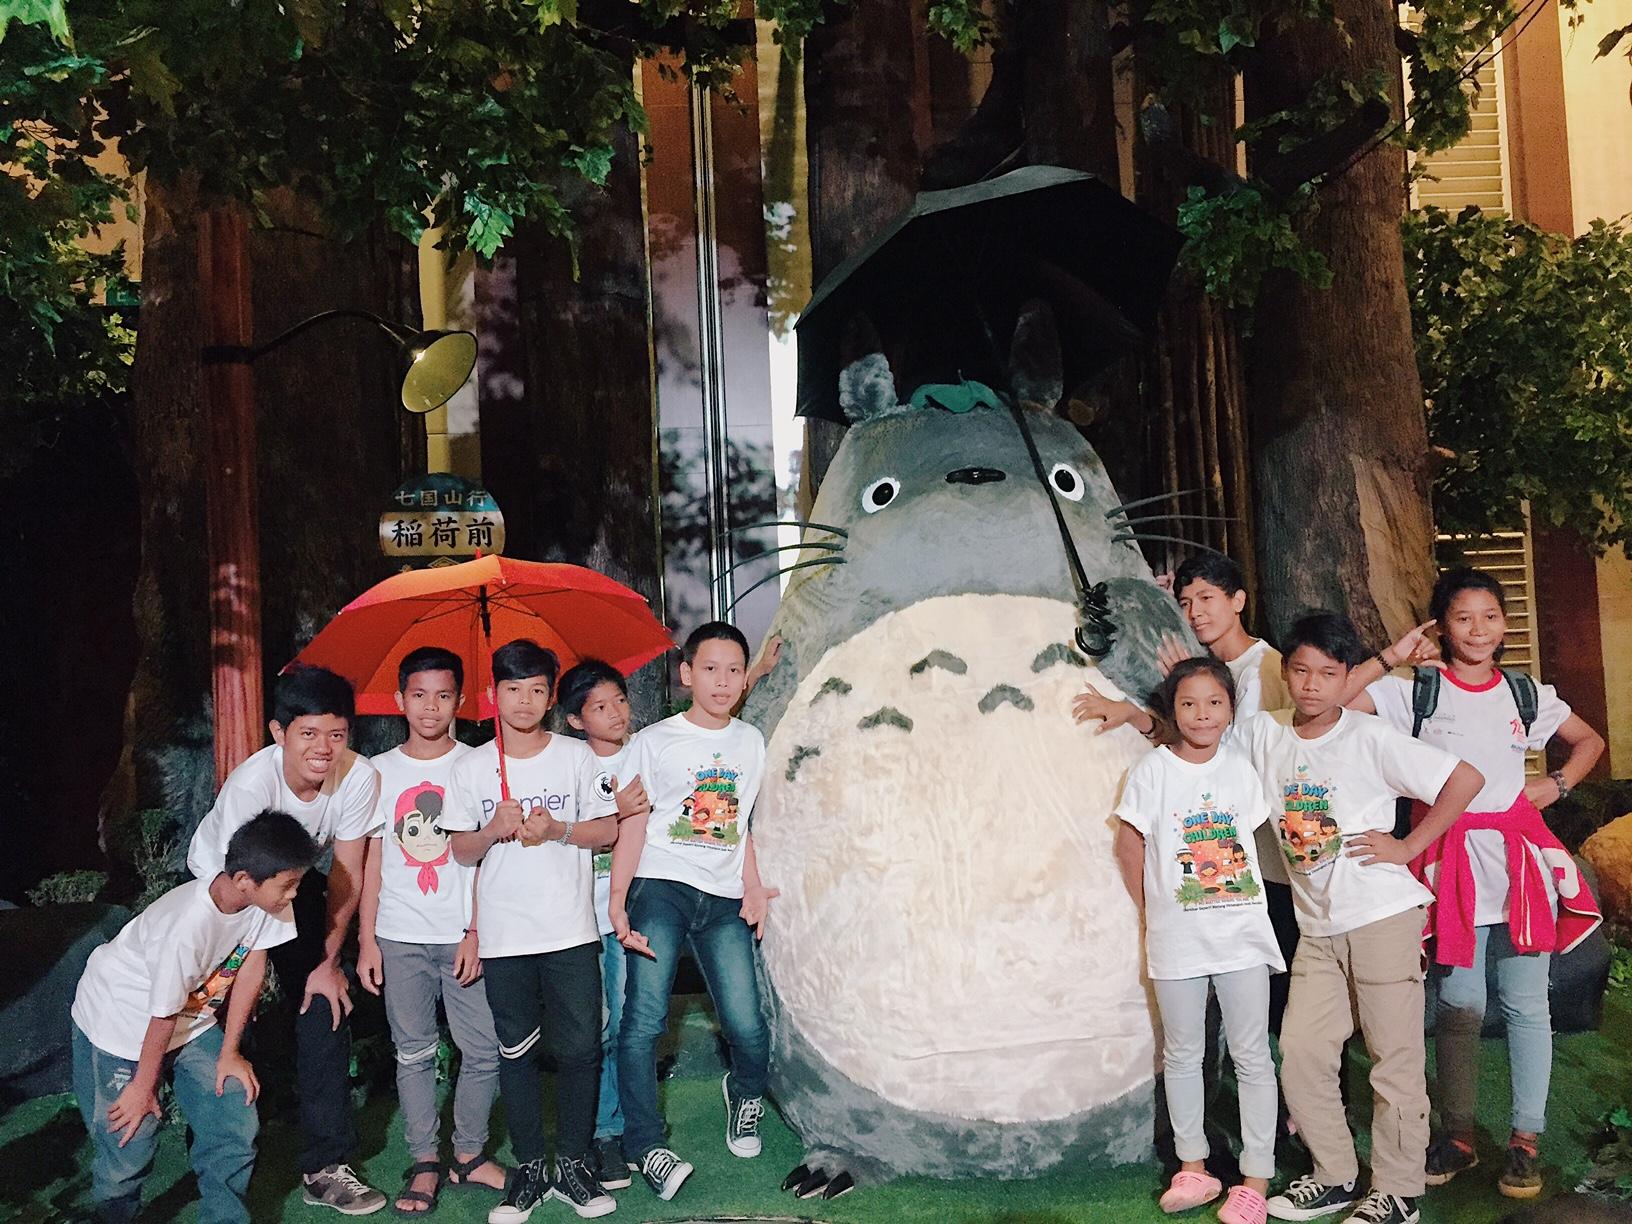 Marubeni's CSR Activity at World of Ghibli Jakarta Exhibition